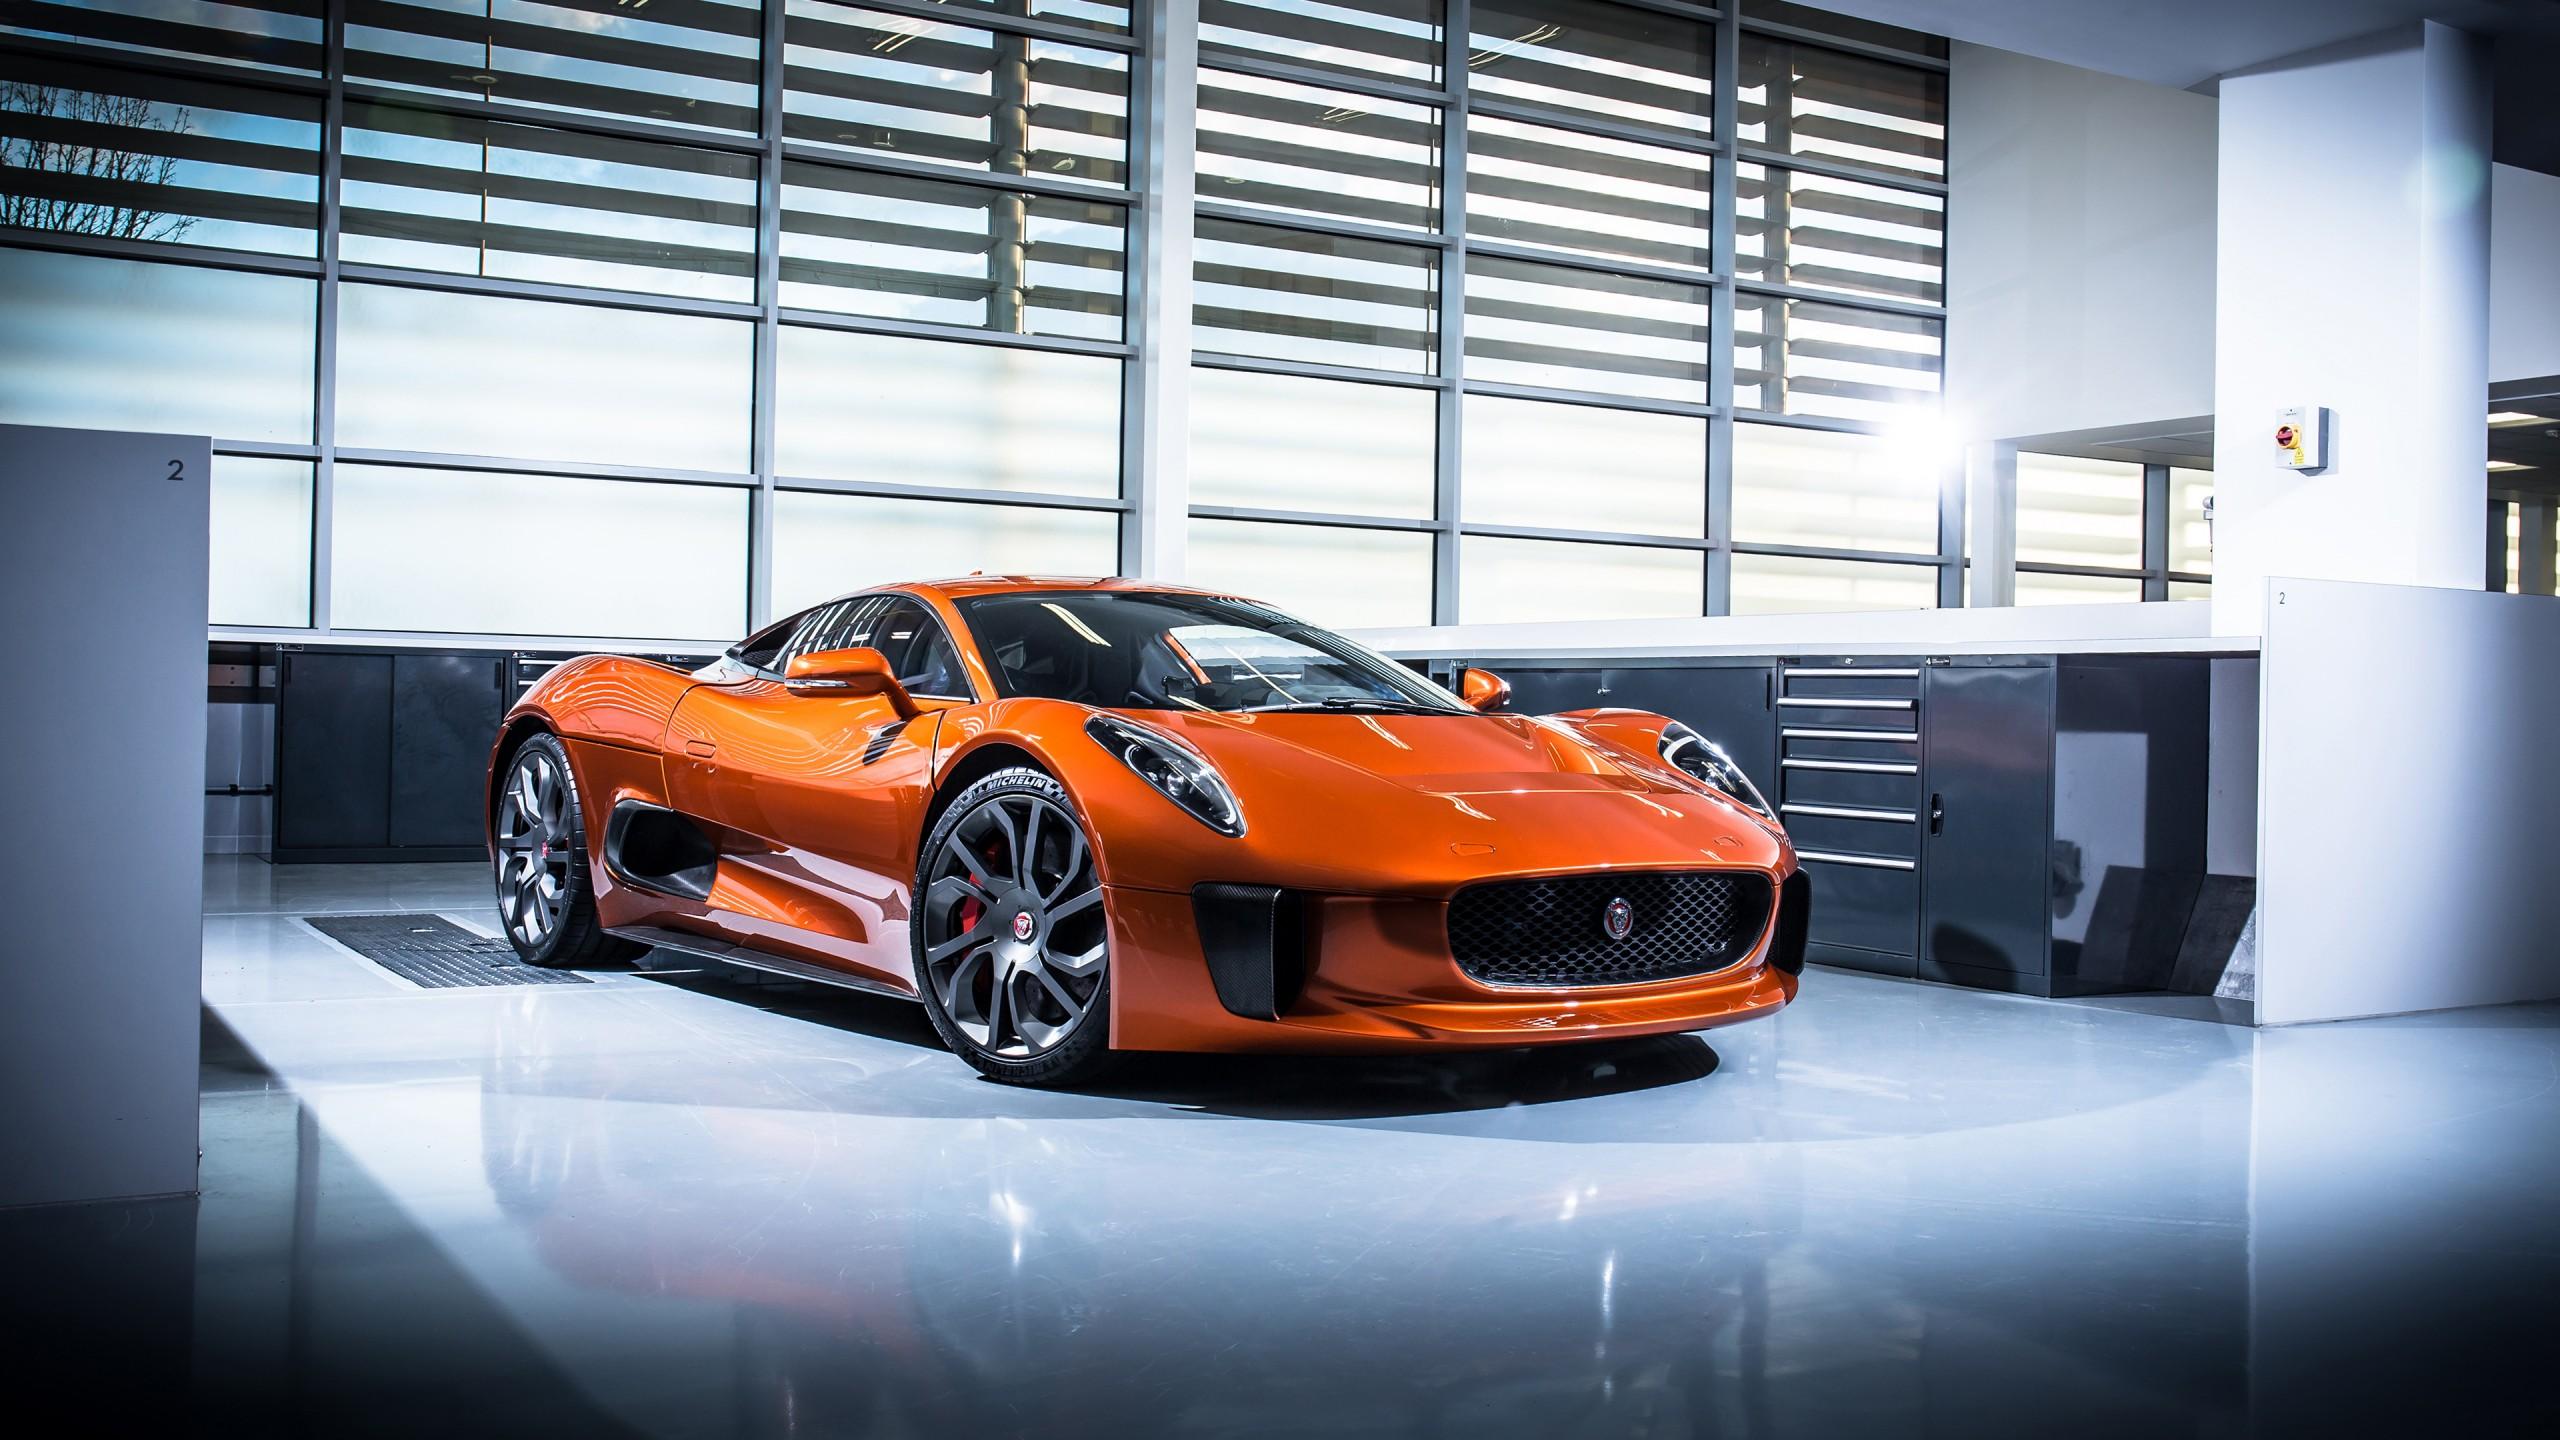 2015 Jaguar C X75 James Bond 007 Spectre Wallpaper Hd Car